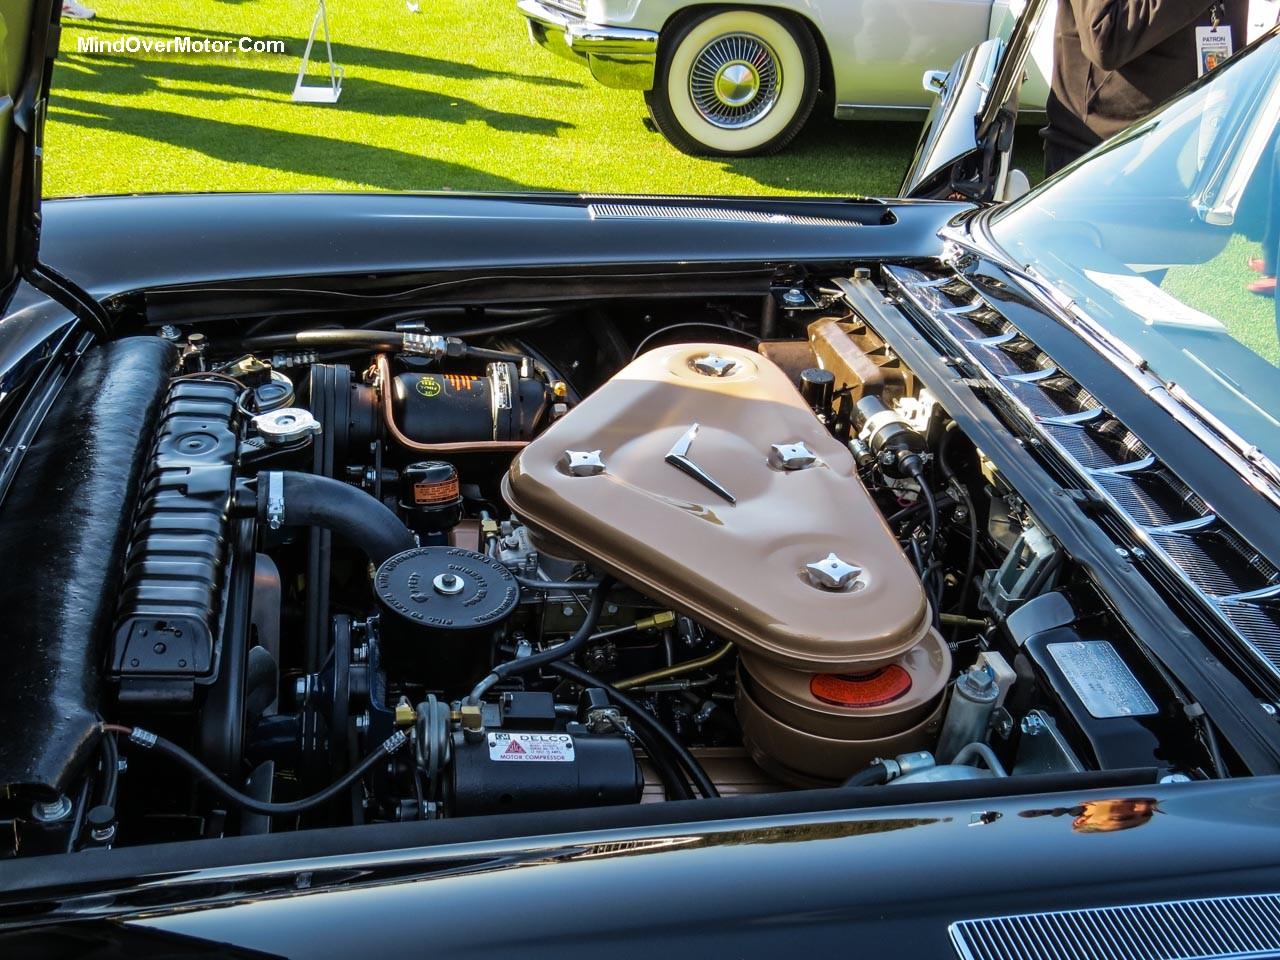 1957 Cadillac Eldorado Brougham Engine